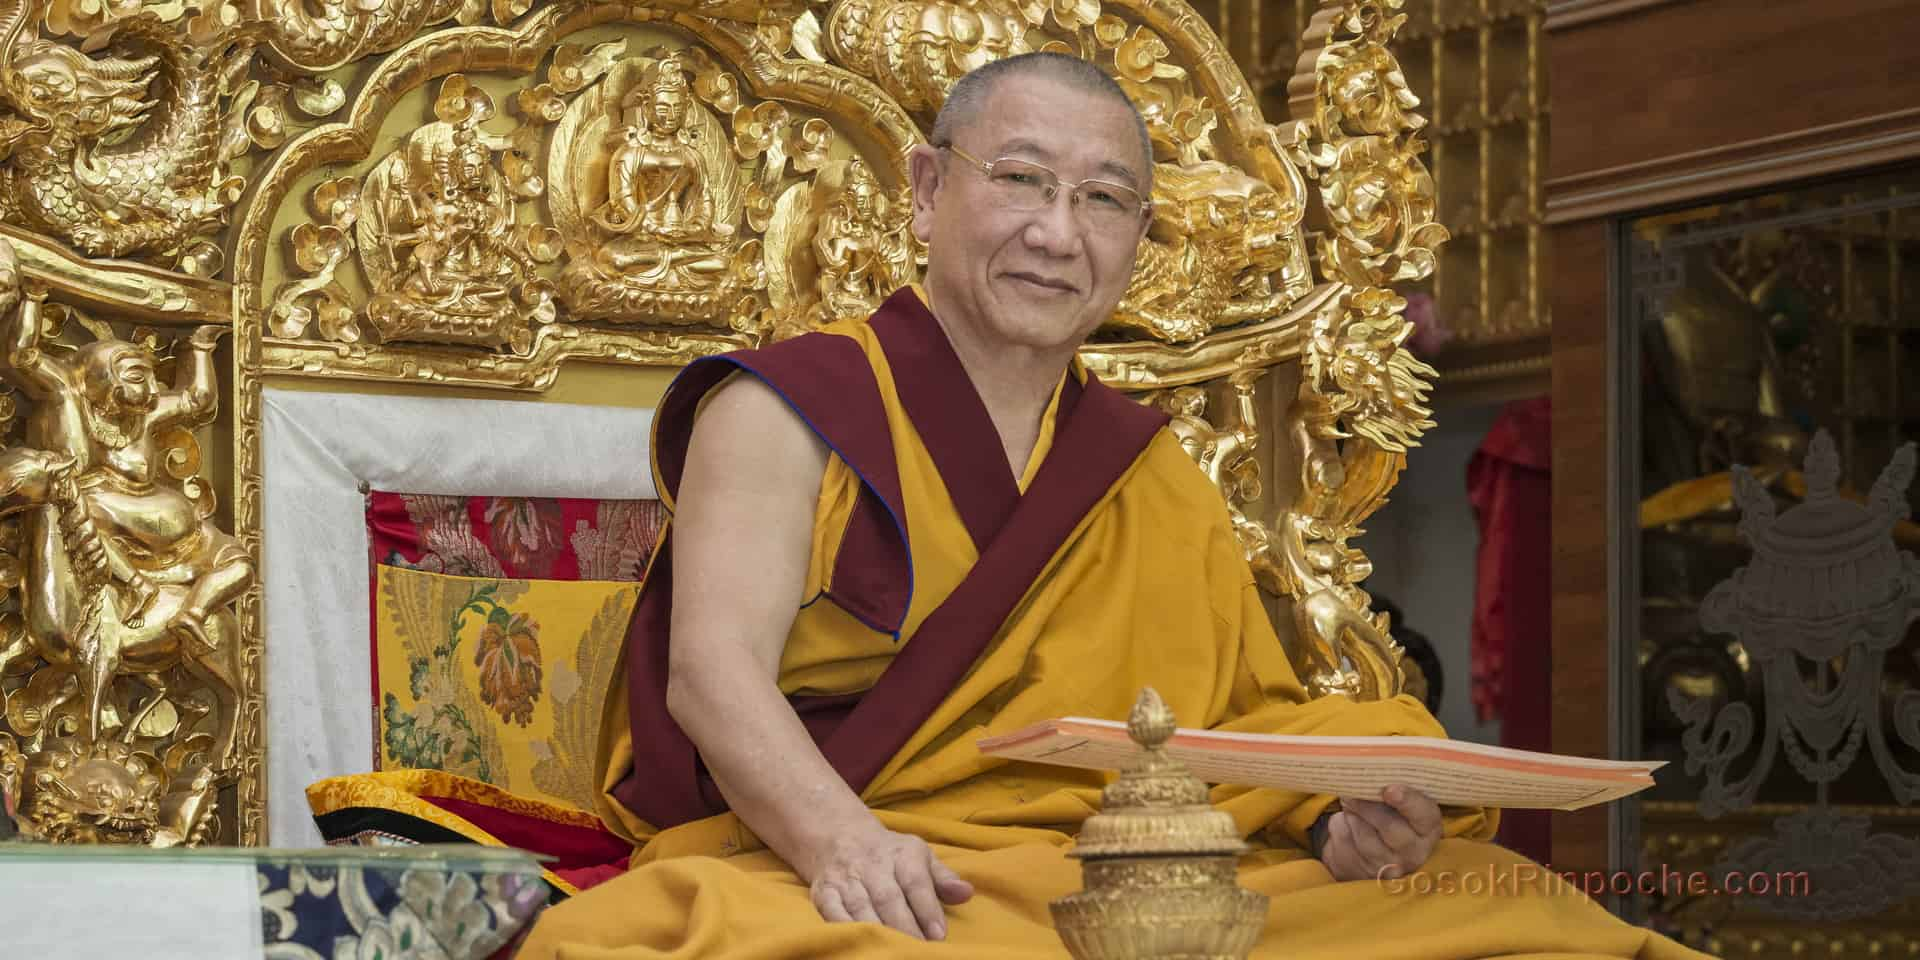 Gosok Rinpoche 05 1920